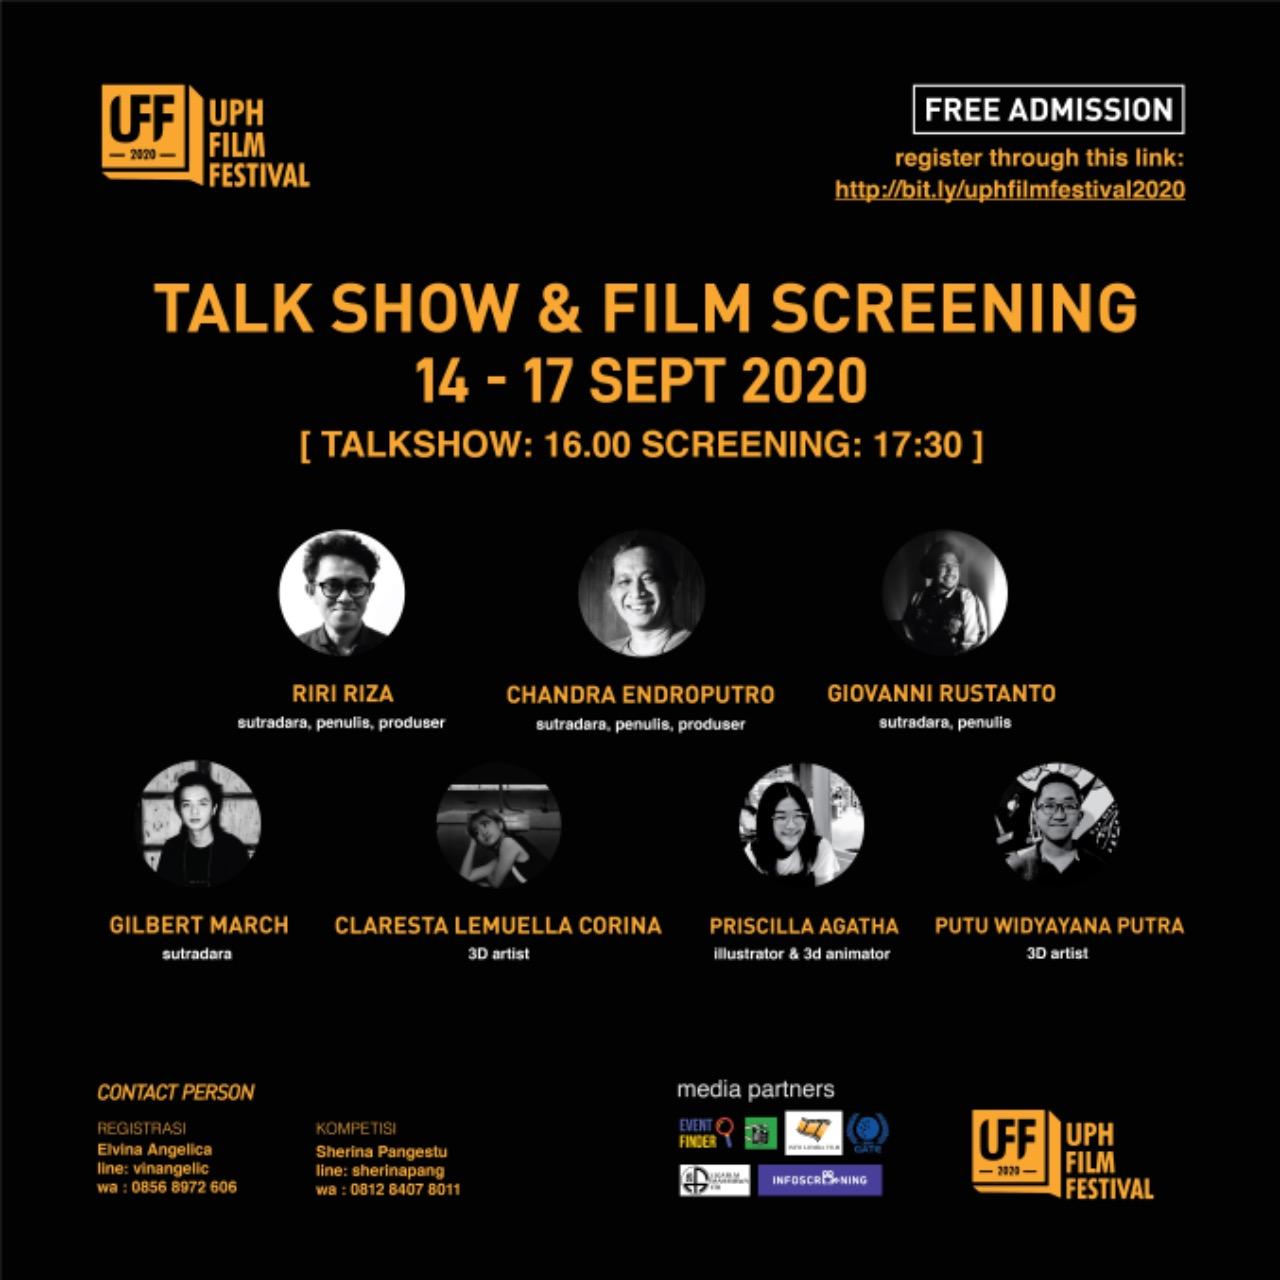 UPH Film Festival 2020: Talk Show & Film Screening